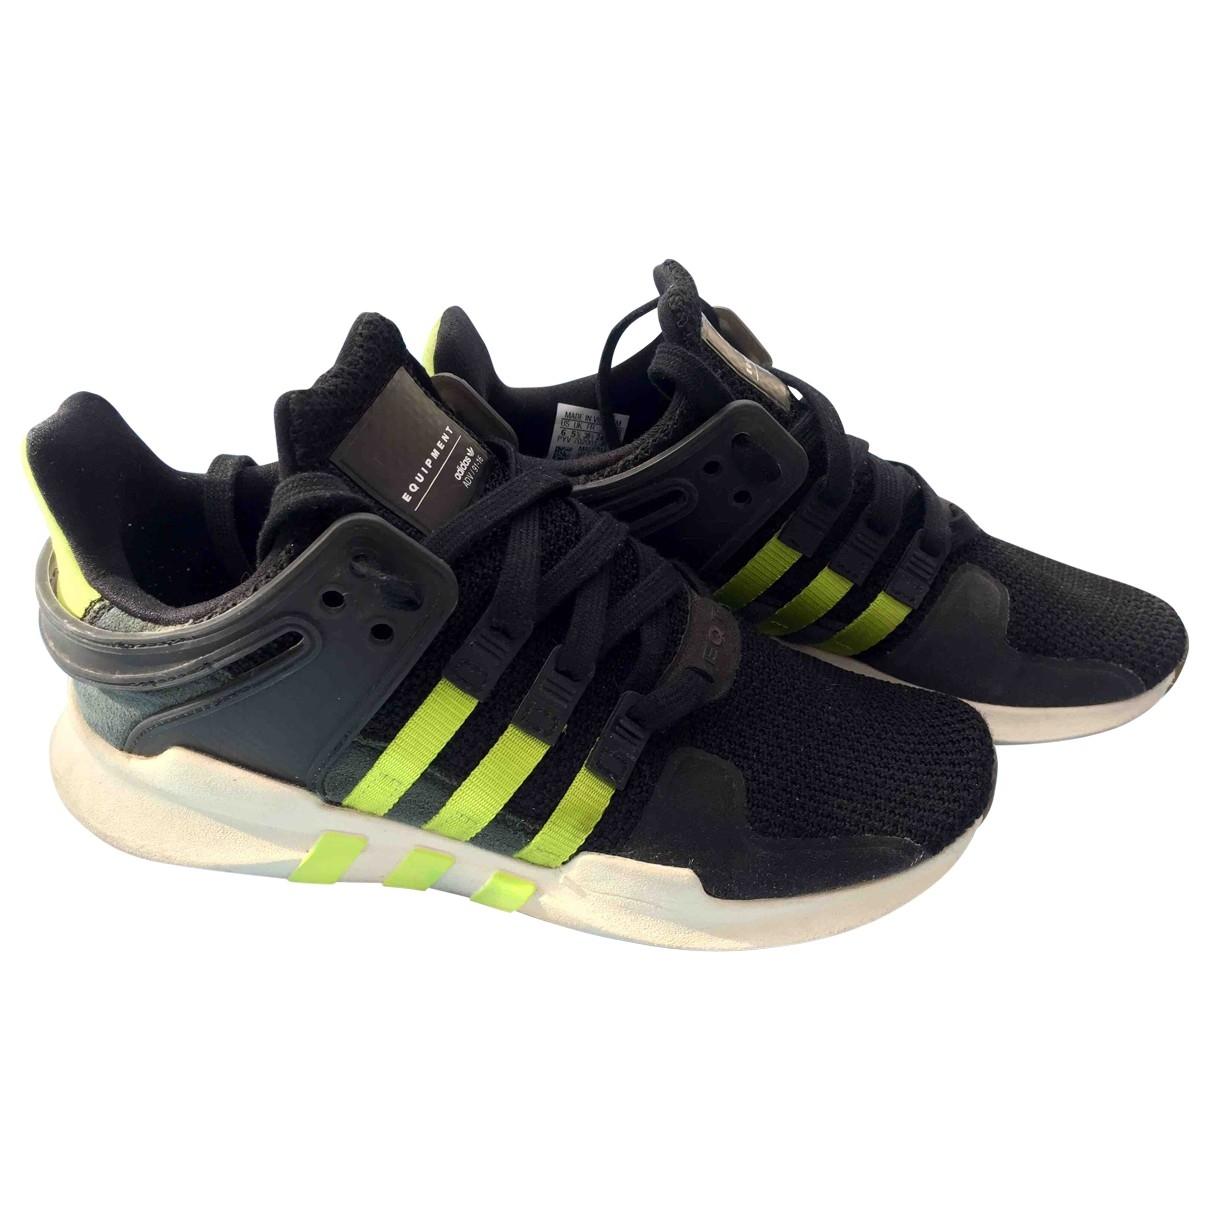 Adidas EQT Support Black Trainers for Women 38.5 EU